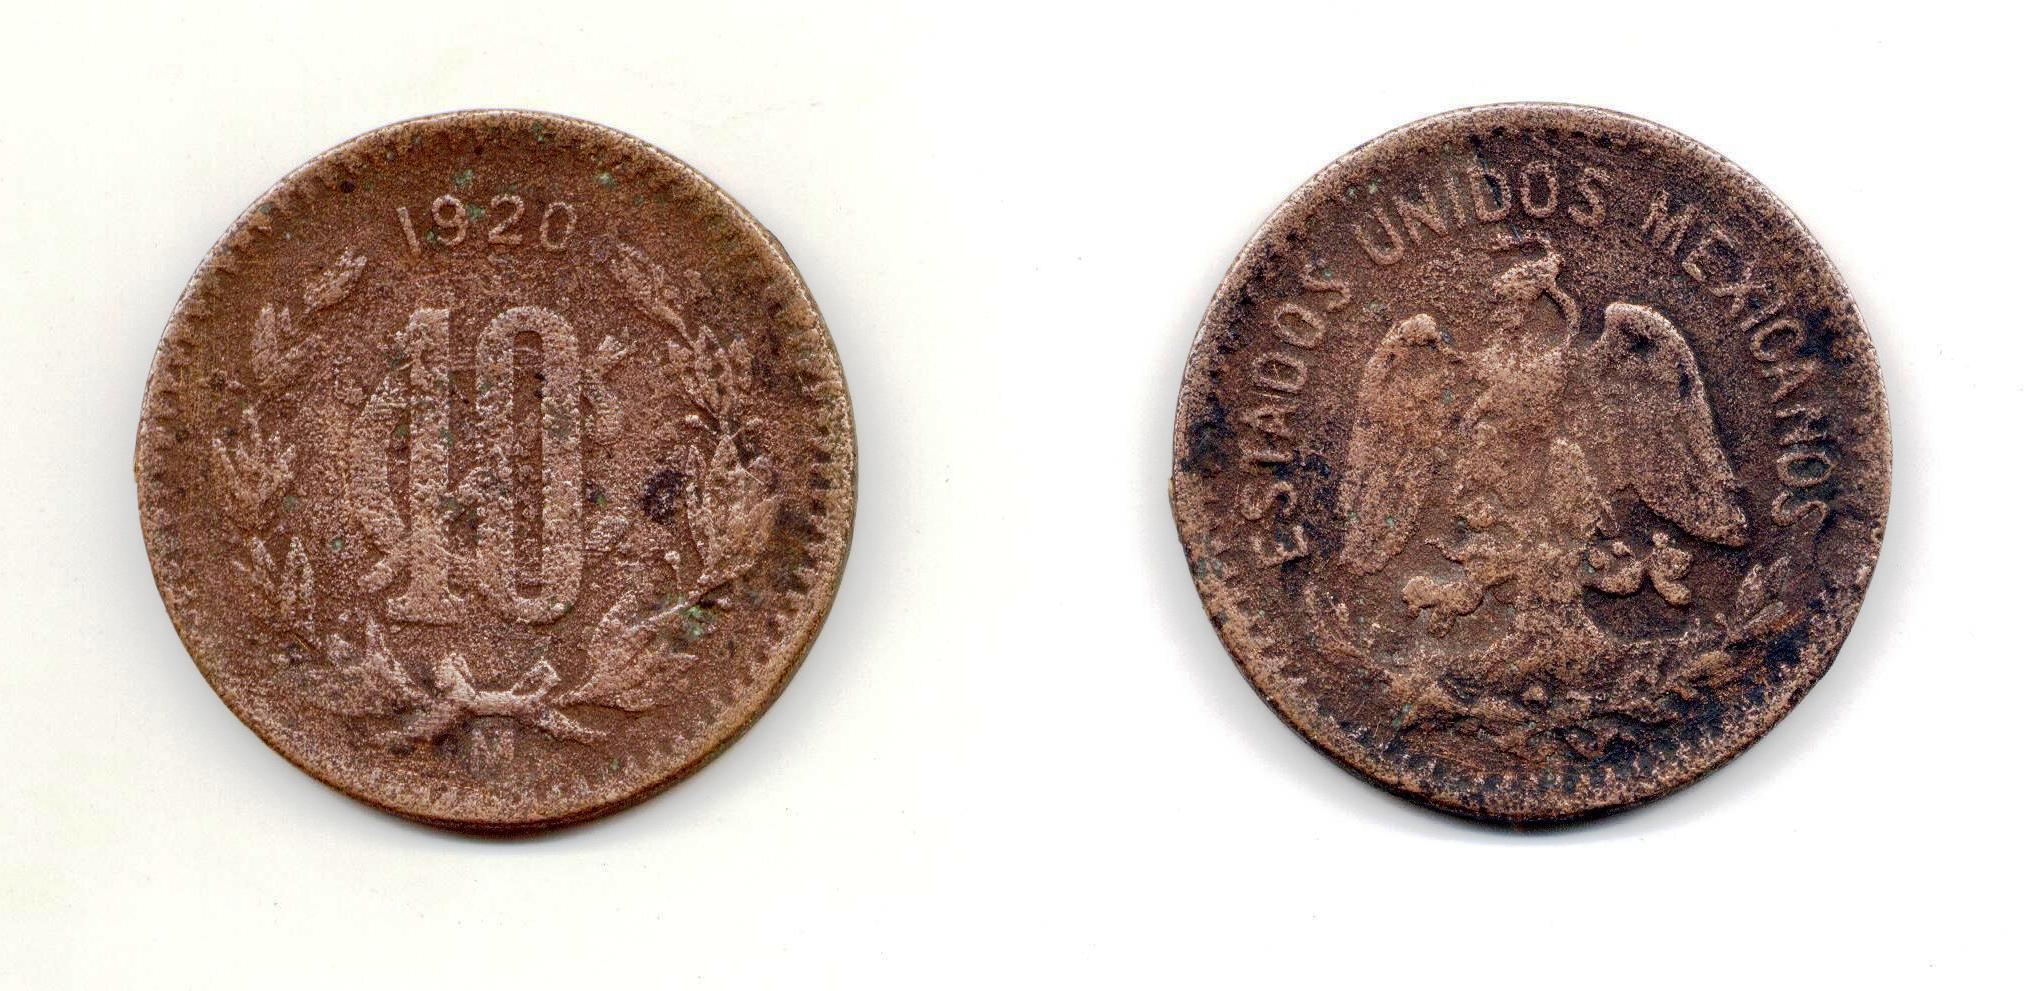 Monedas de 10 Centavos Mexico File:10 Centavos de México de